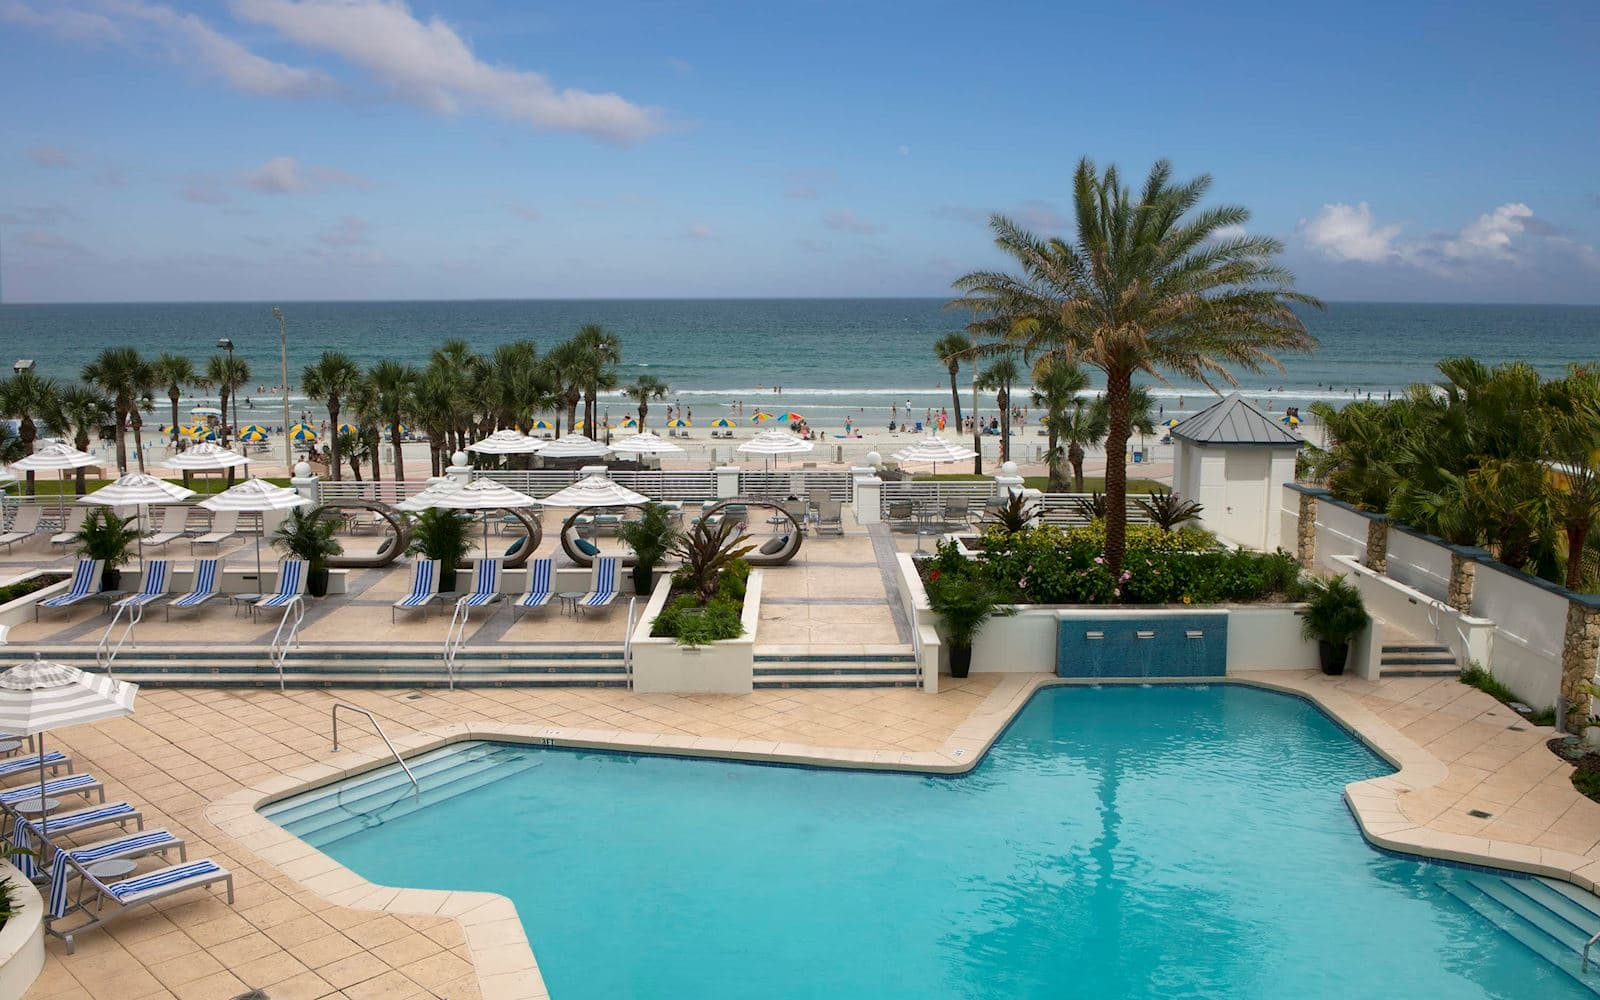 Daytona Beach Hotel, Florida Resident Offers